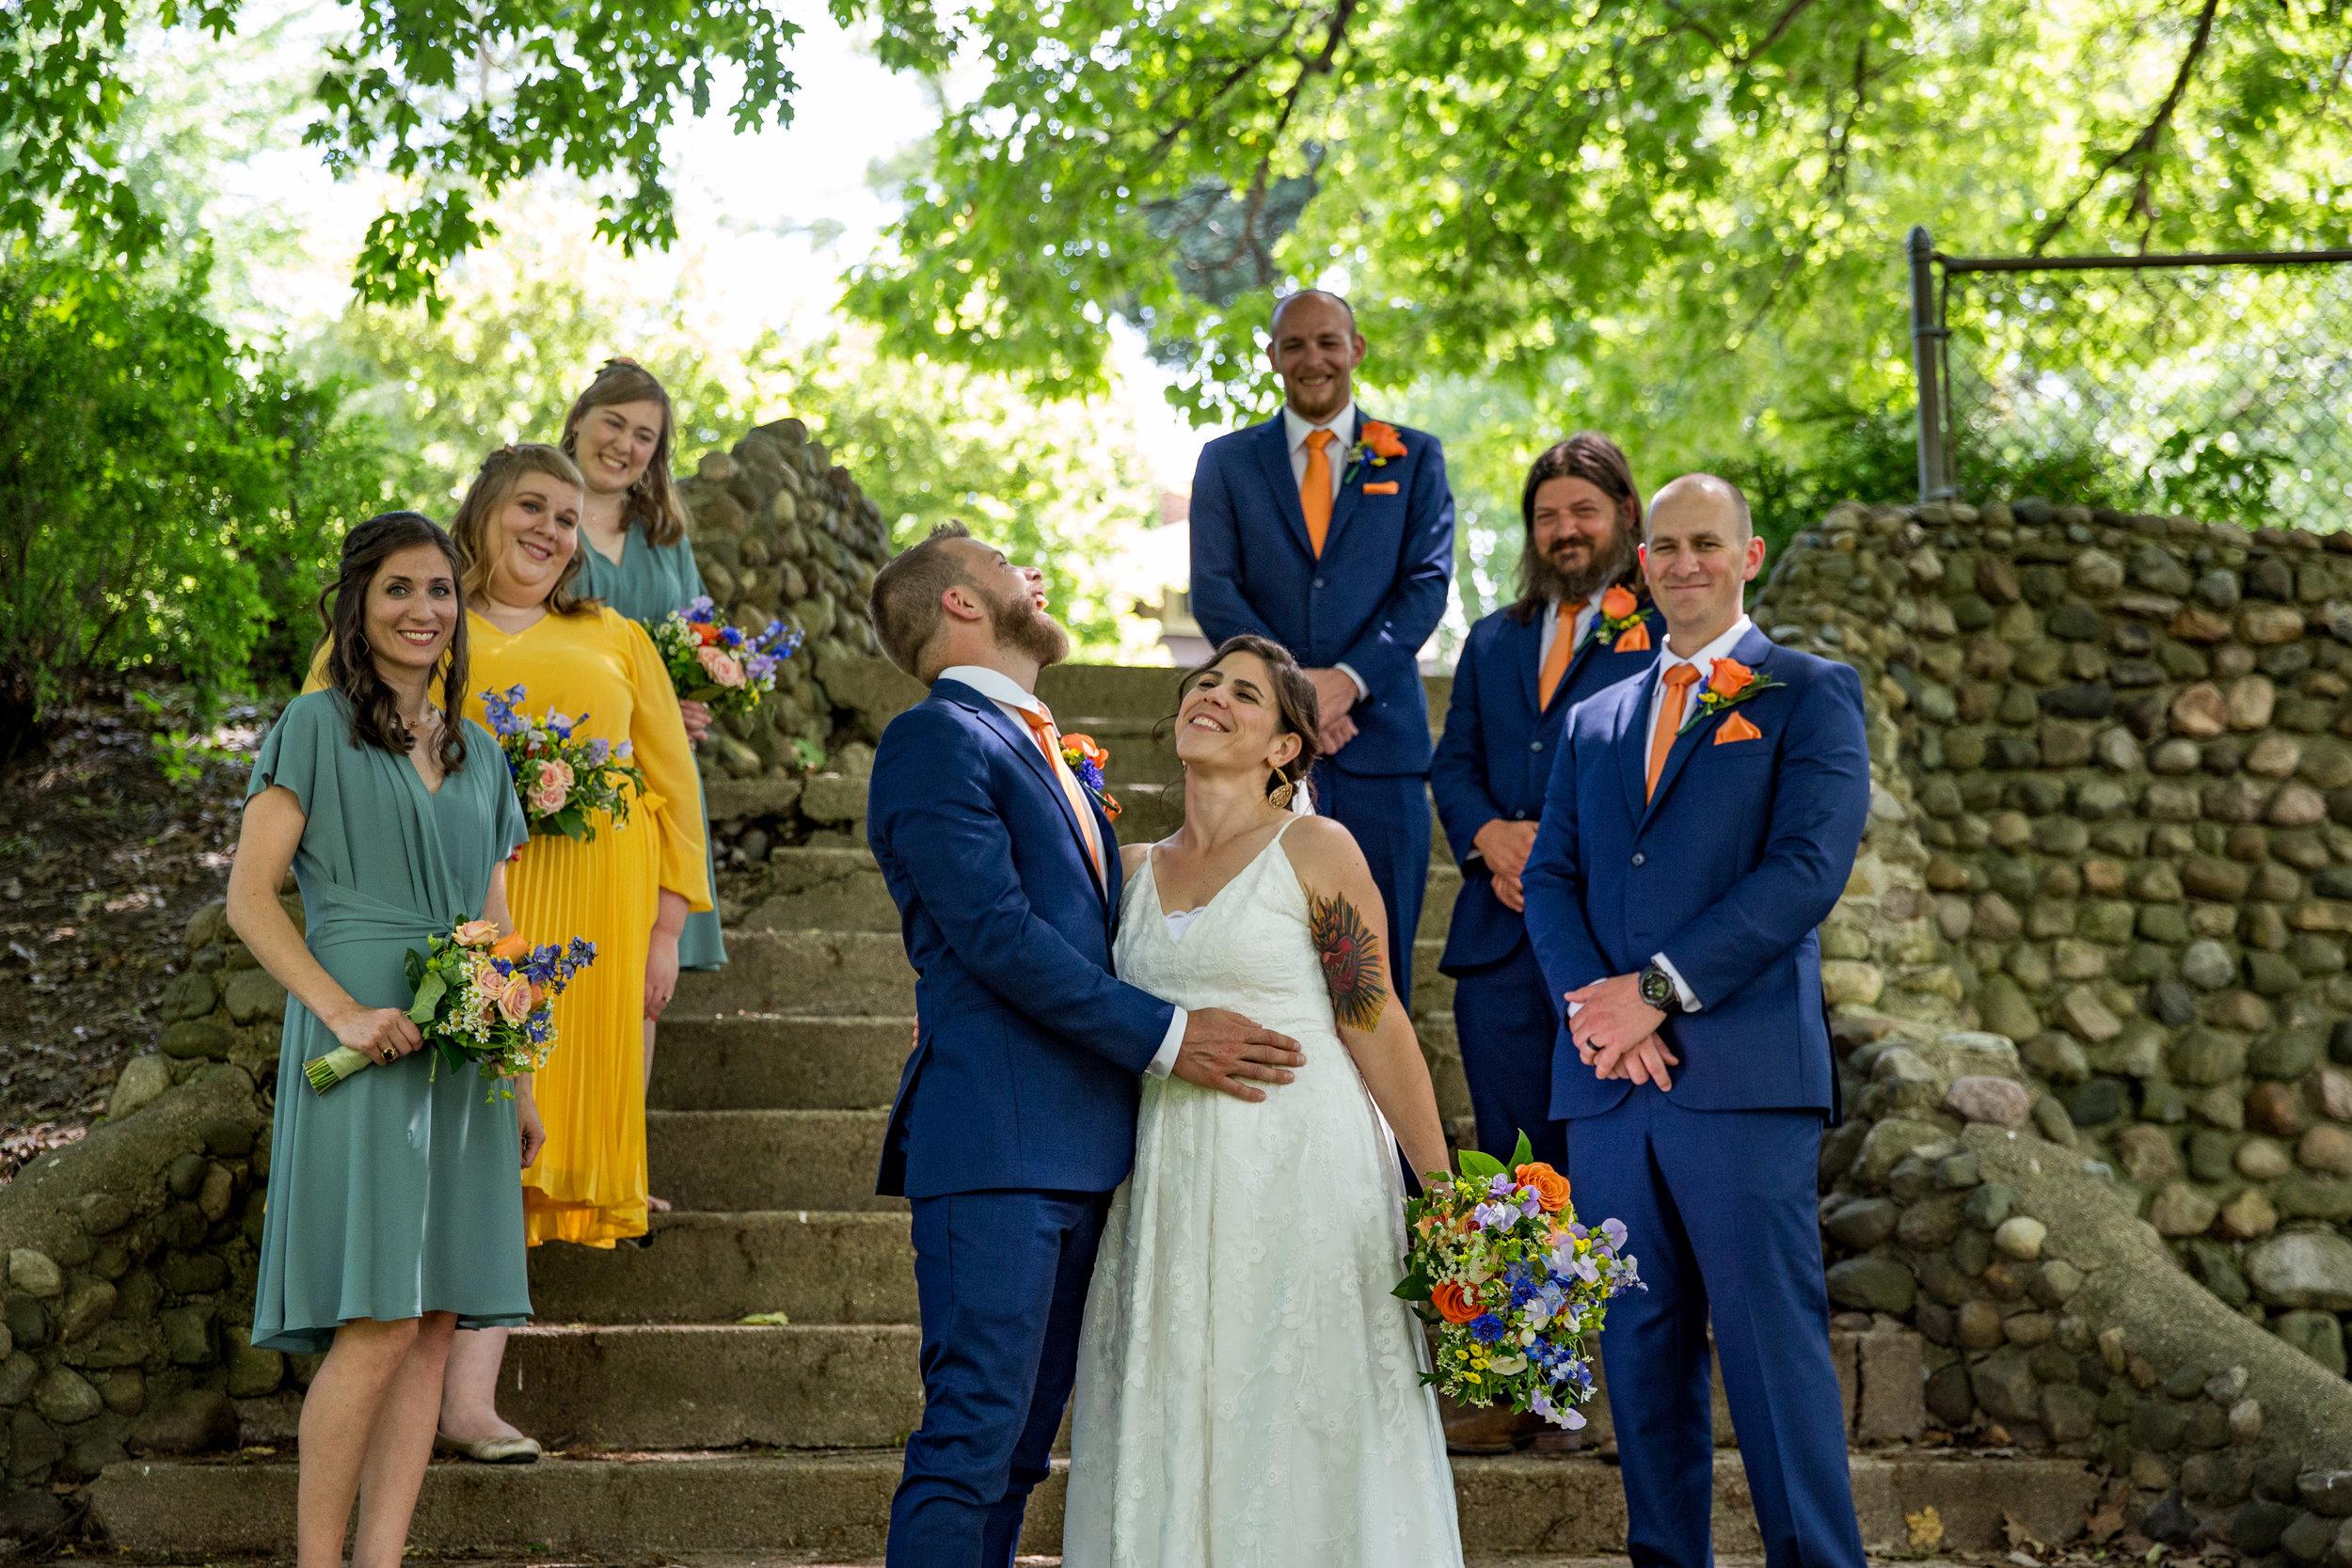 Natalie and Dallas Mooney Wedding 6-8-19_Tania Watt Photography-302.jpg